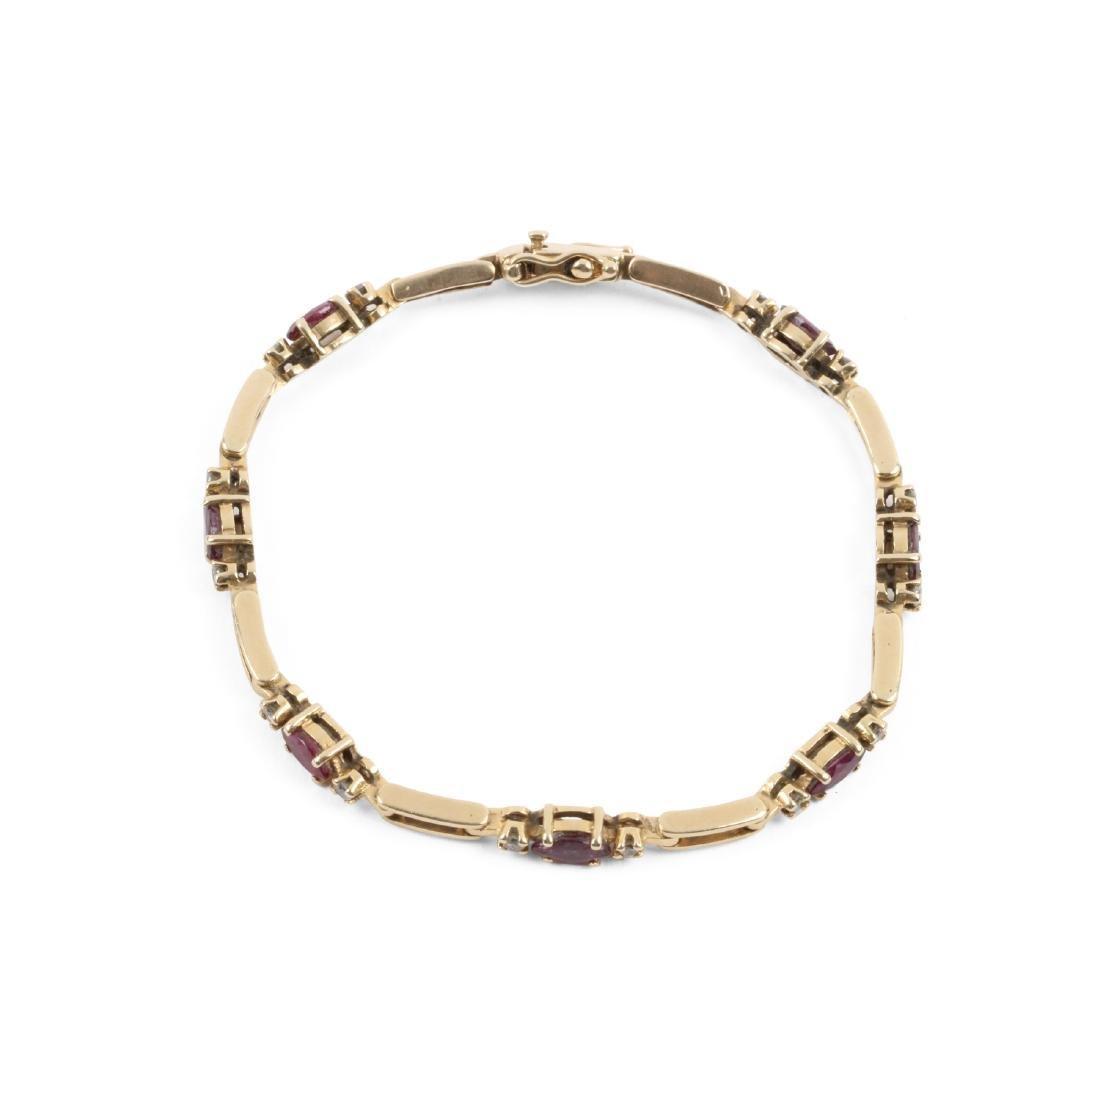 A 14K, Amethyst & Diamond Tennis Bracelet